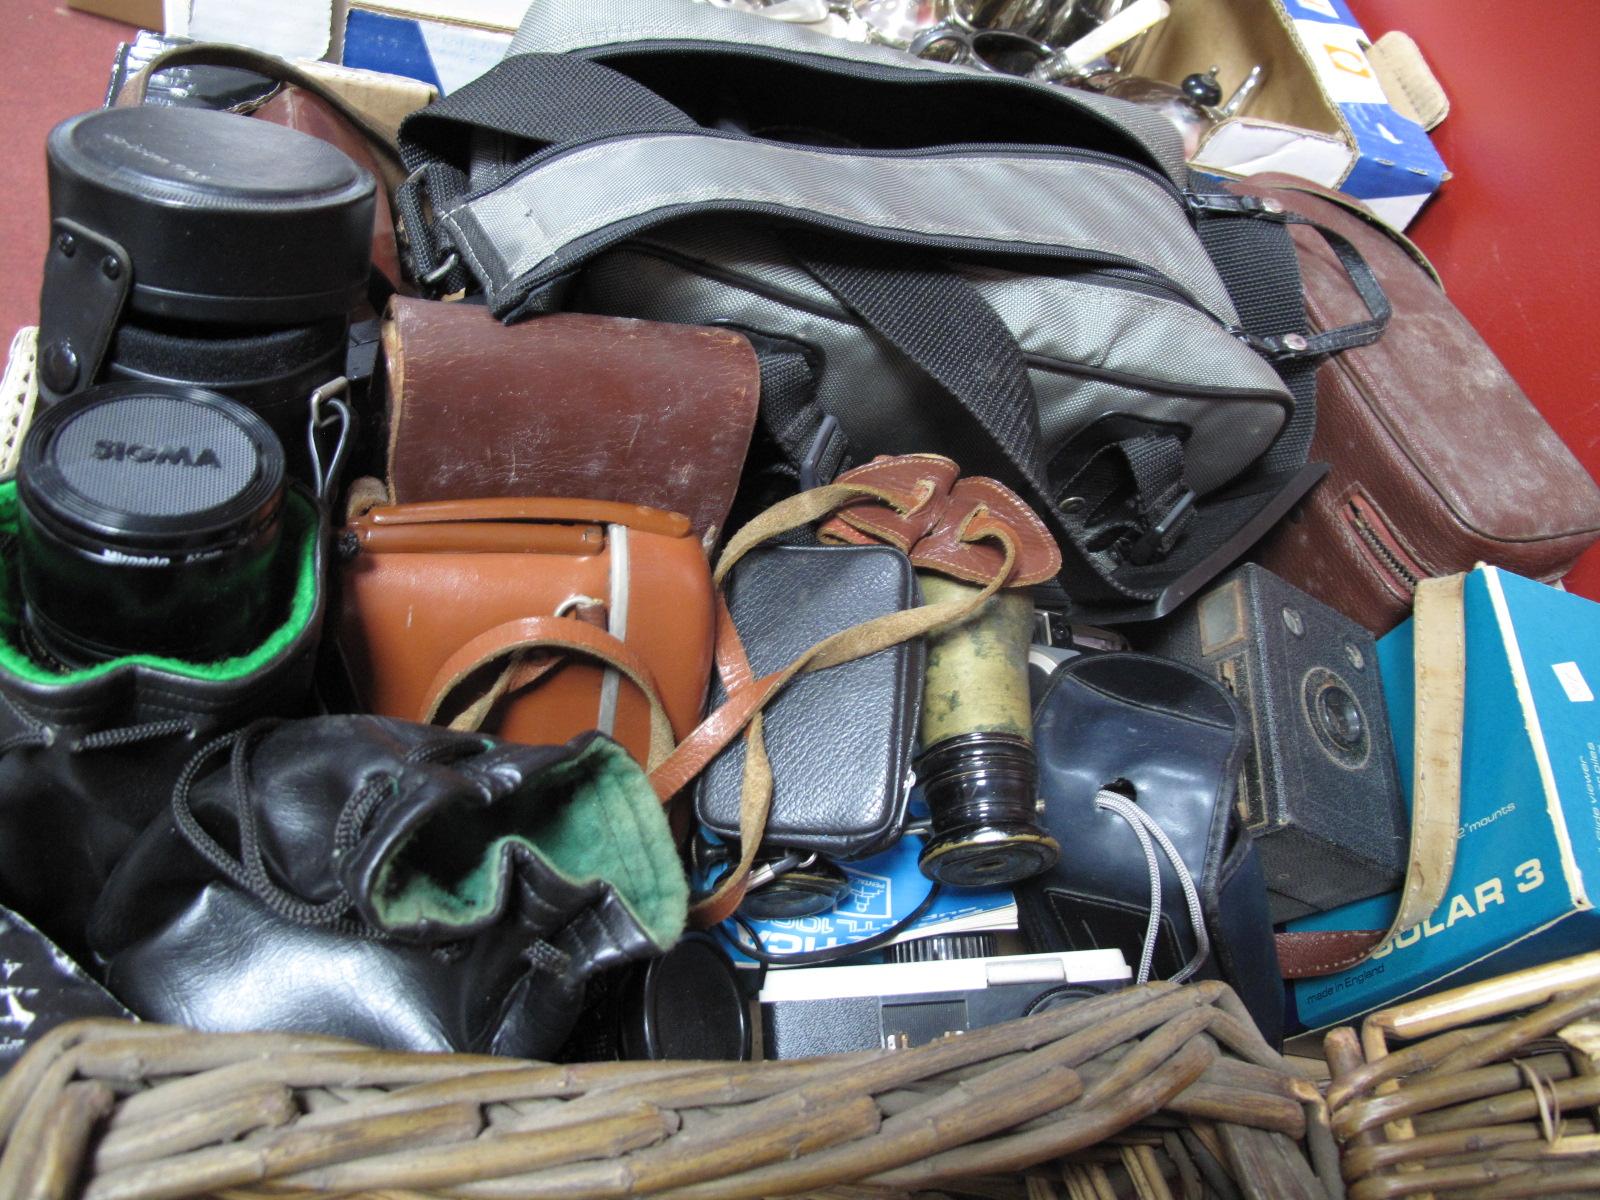 Lot 1003A - Camera: Kodak, Werra, etc lenses - Sigma zoom 1:4.5 f=100. Flektogon 2.4/35, Pentagon Auto 1.8/50,